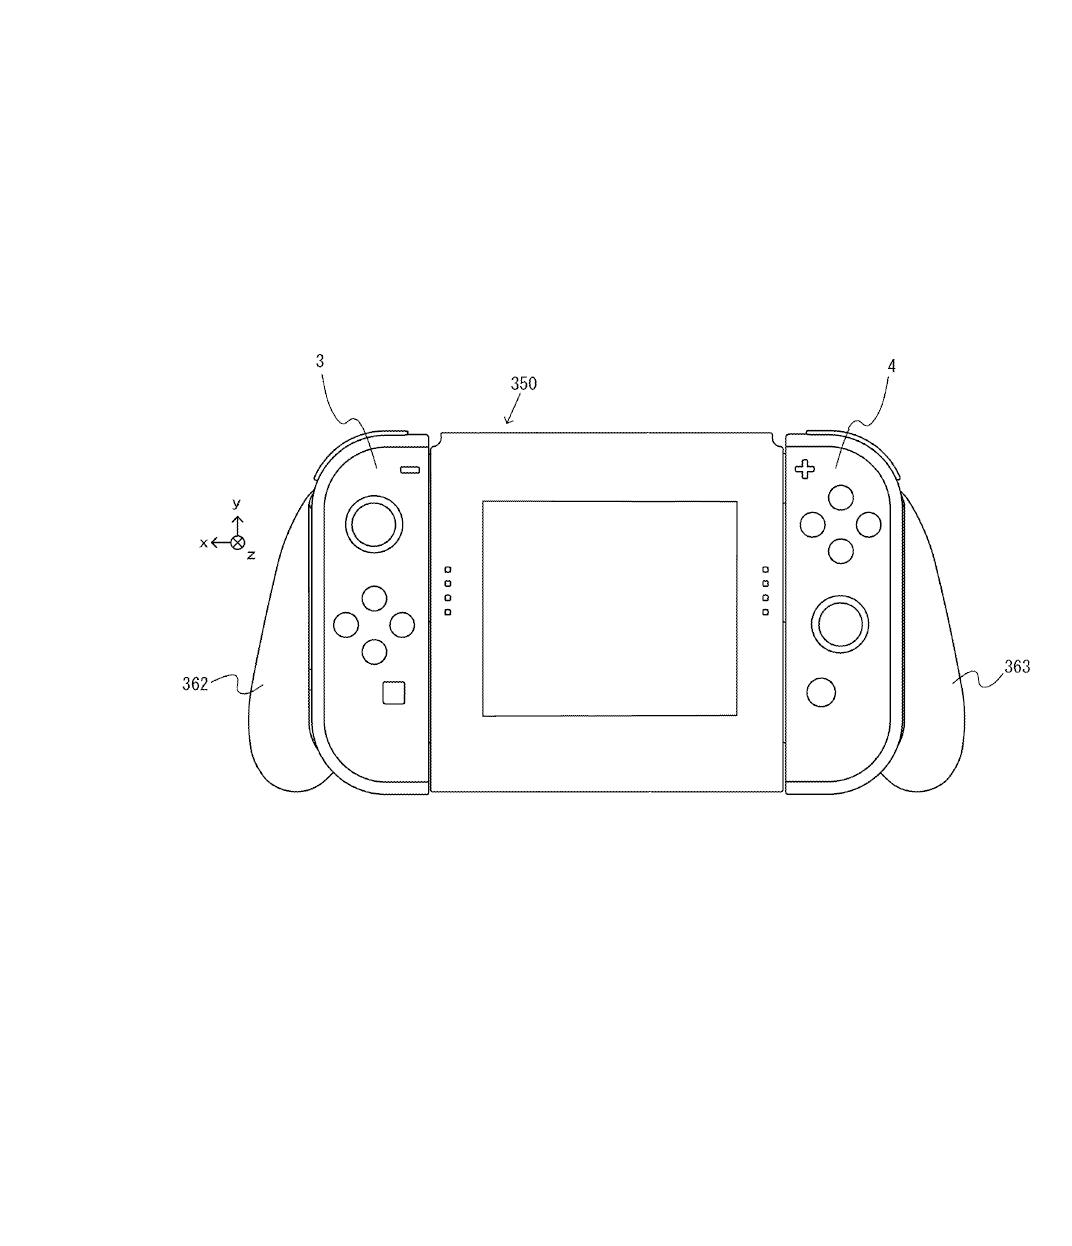 Nintendo Switch Joycon Grip Touchscreen idea. : NintendoSwitch